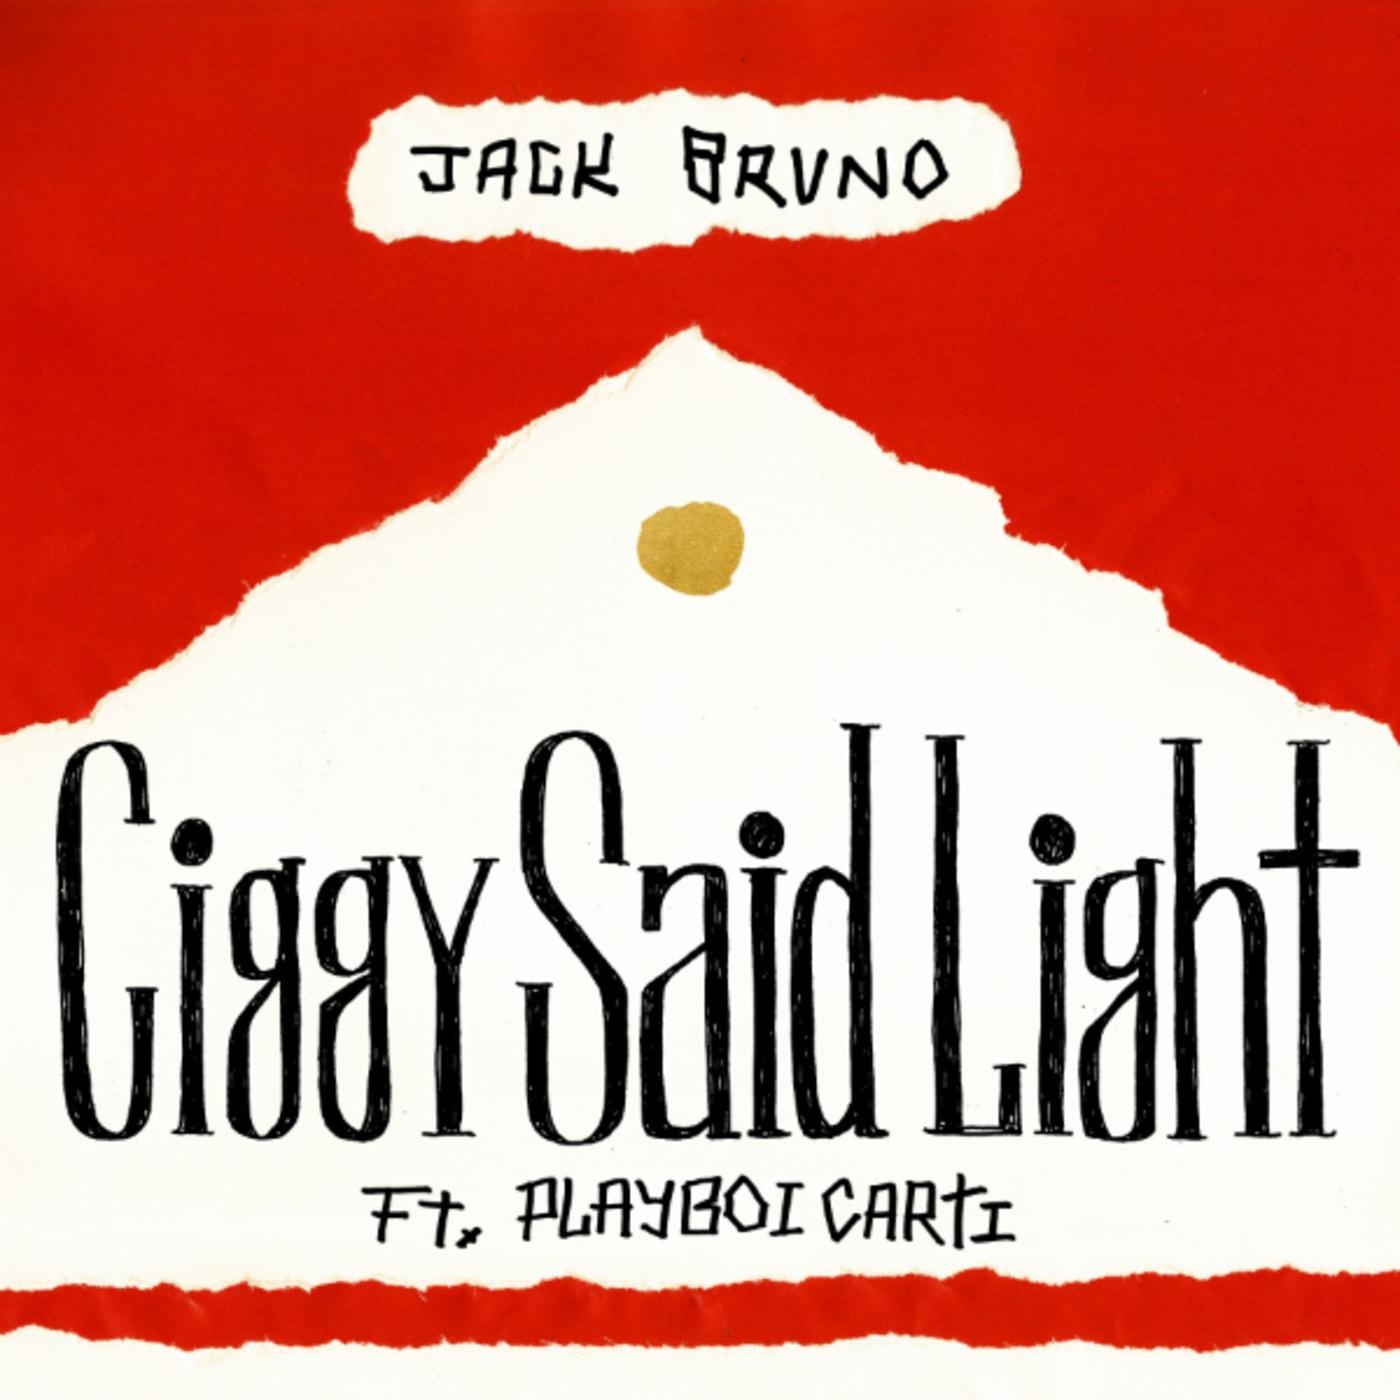 ciggy said light